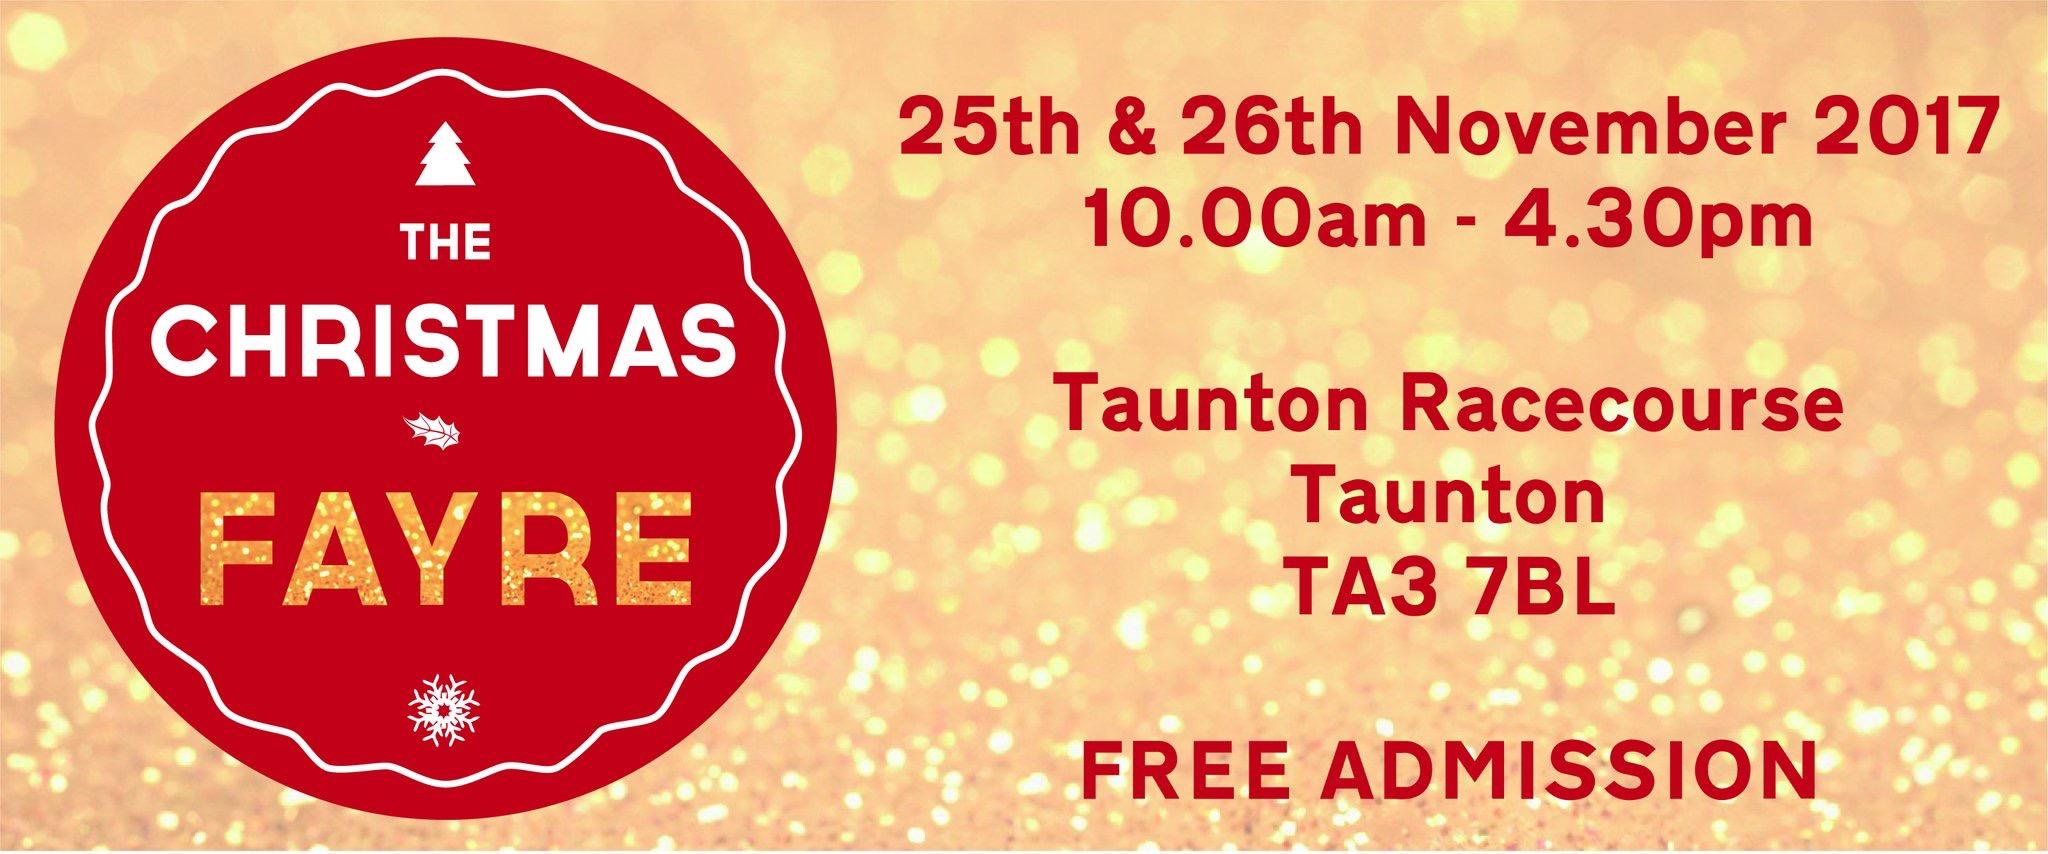 Christmas Fair @ Taunton Racecourse | England | United Kingdom